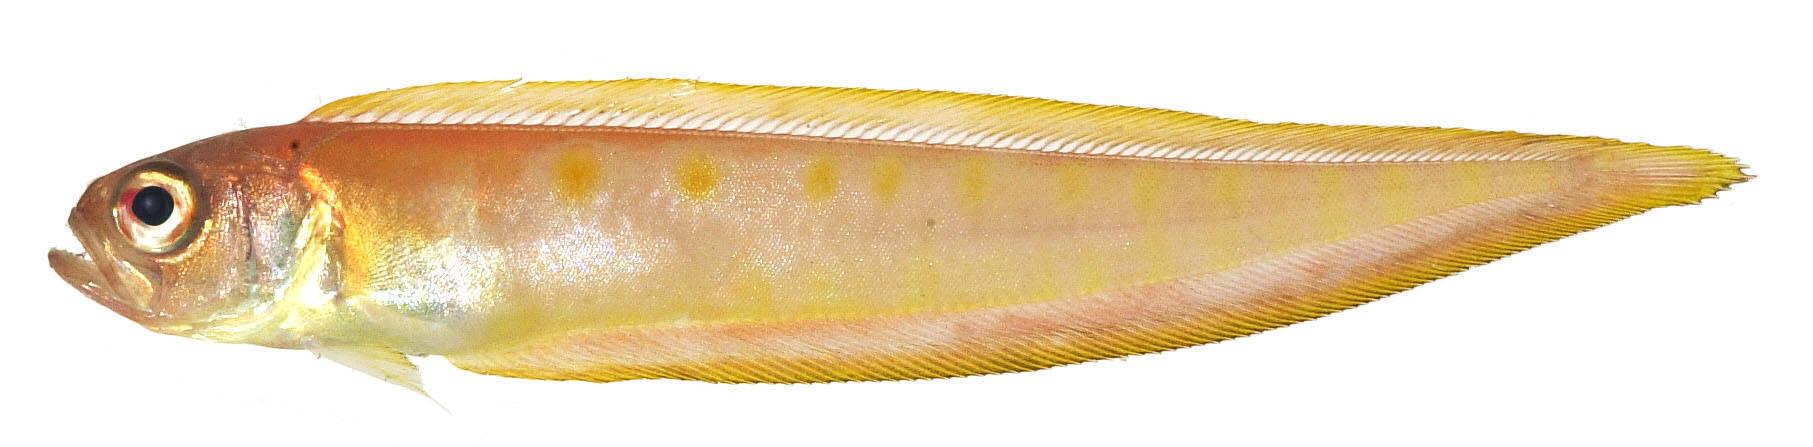 Image of Cepola